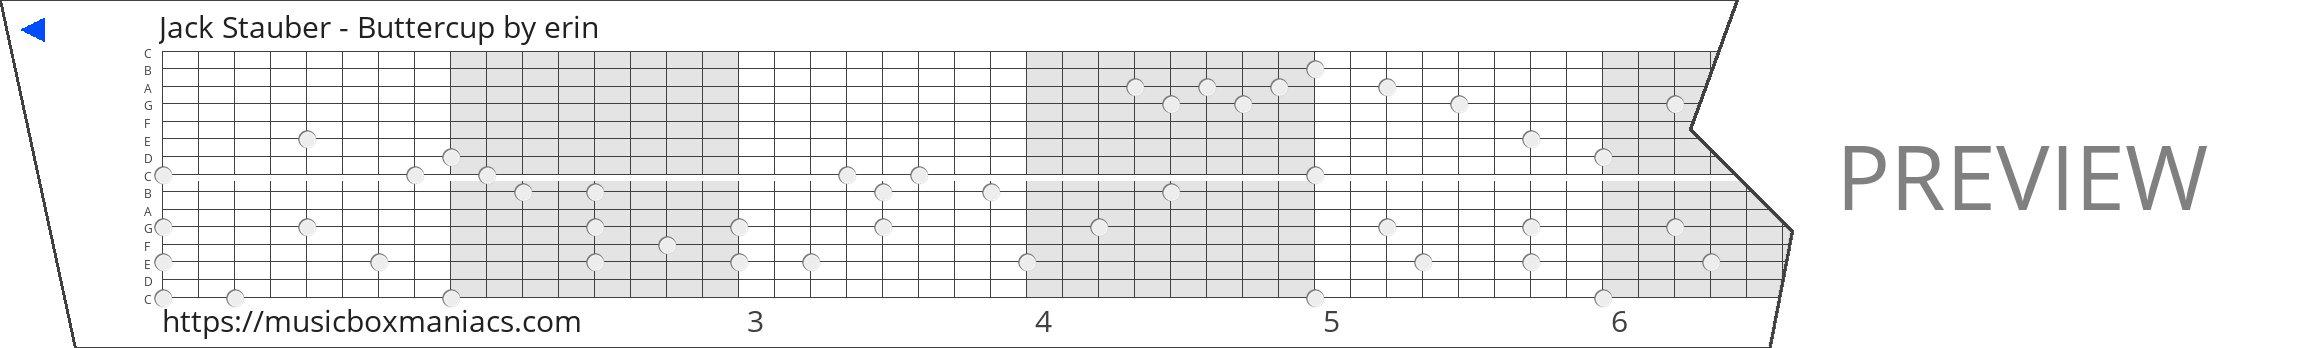 Jack Stauber - Buttercup 15 note music box paper strip